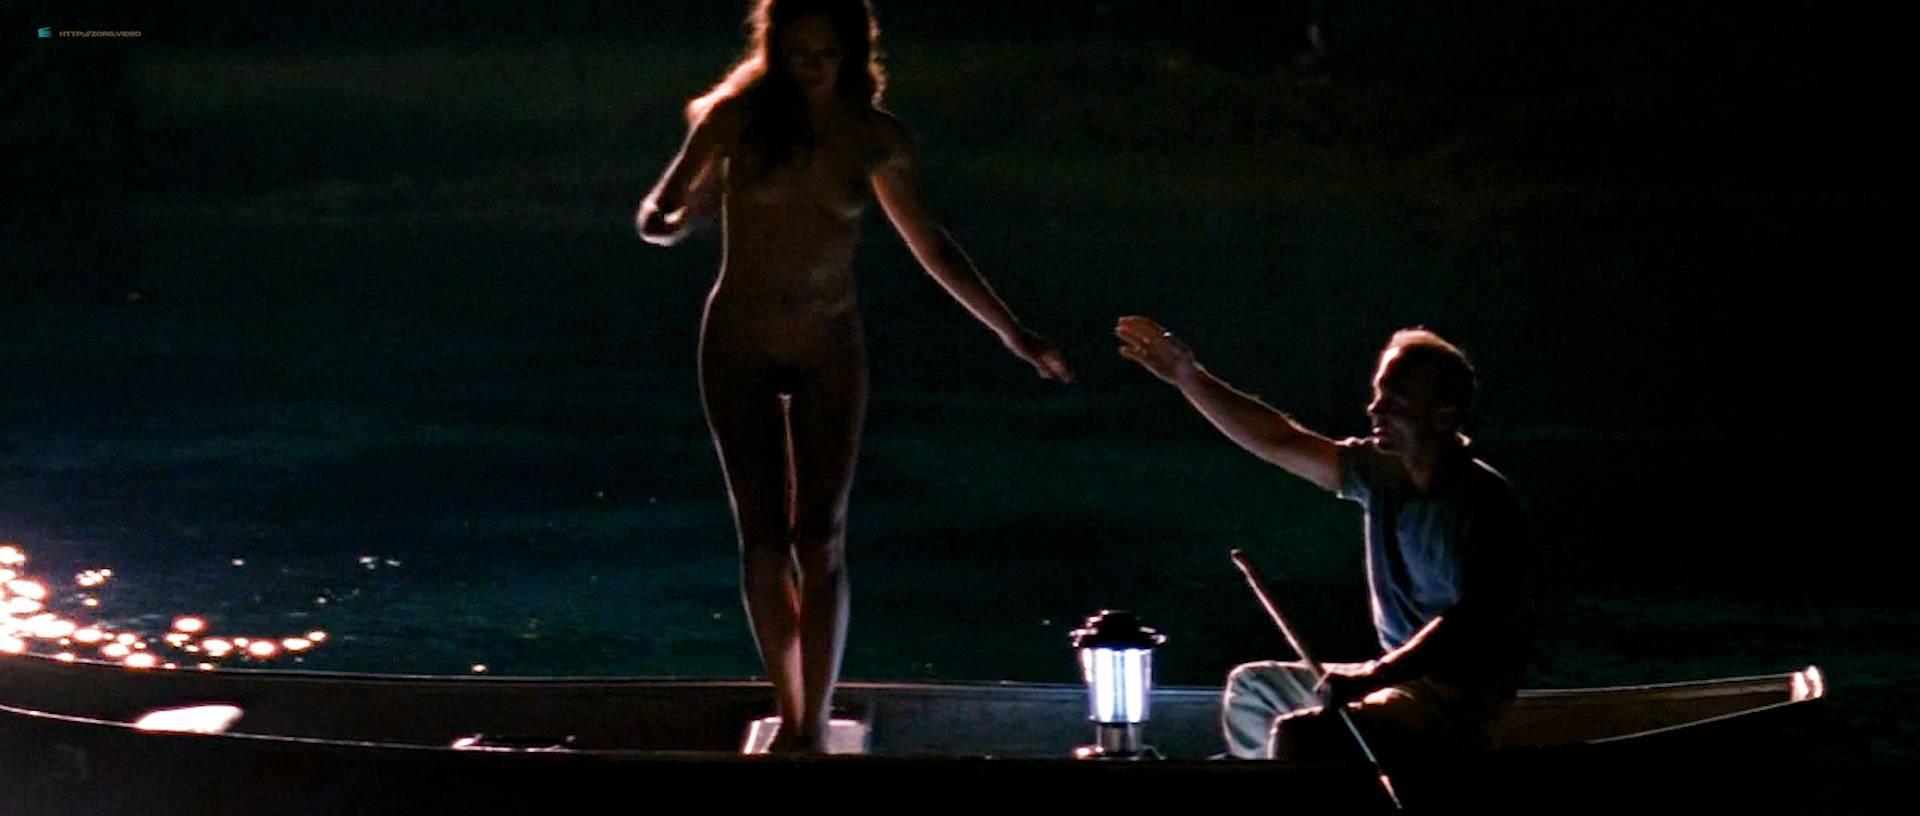 Patricia healy nude